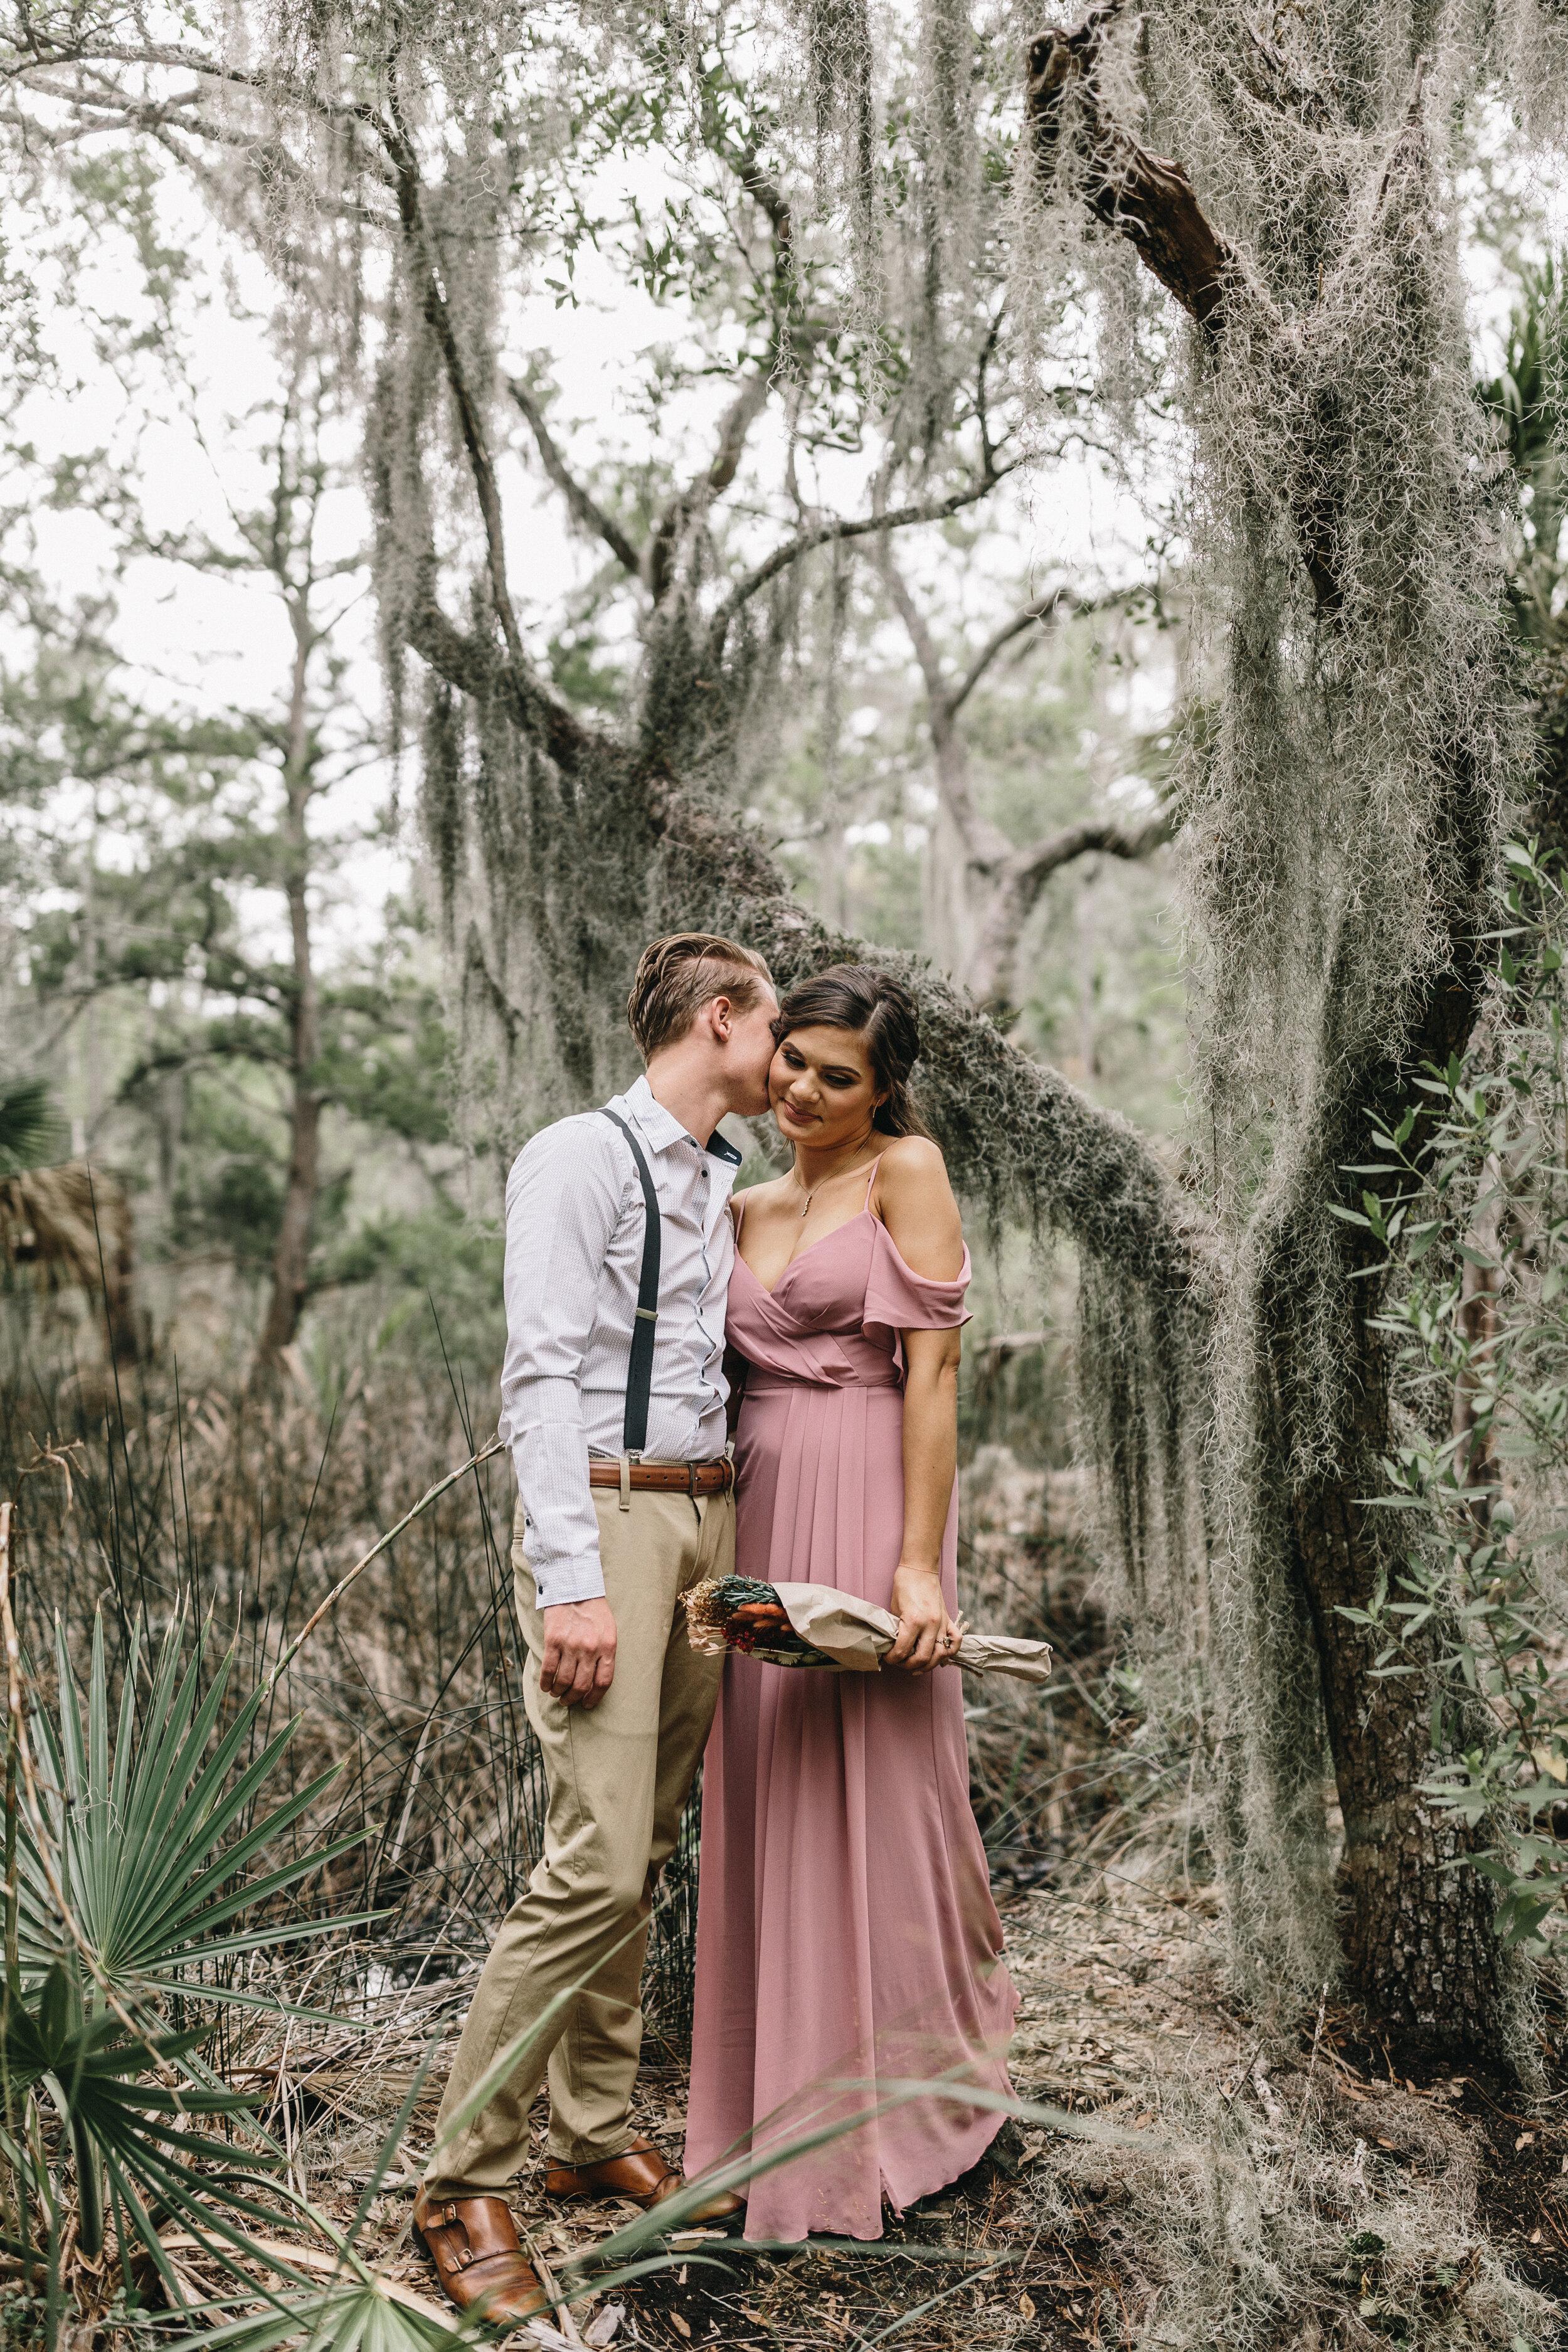 ivory-and-beau-couple-weddings-engagement-session-savannah-weddings-Mary+Cameron_engagementsession-2.jpg